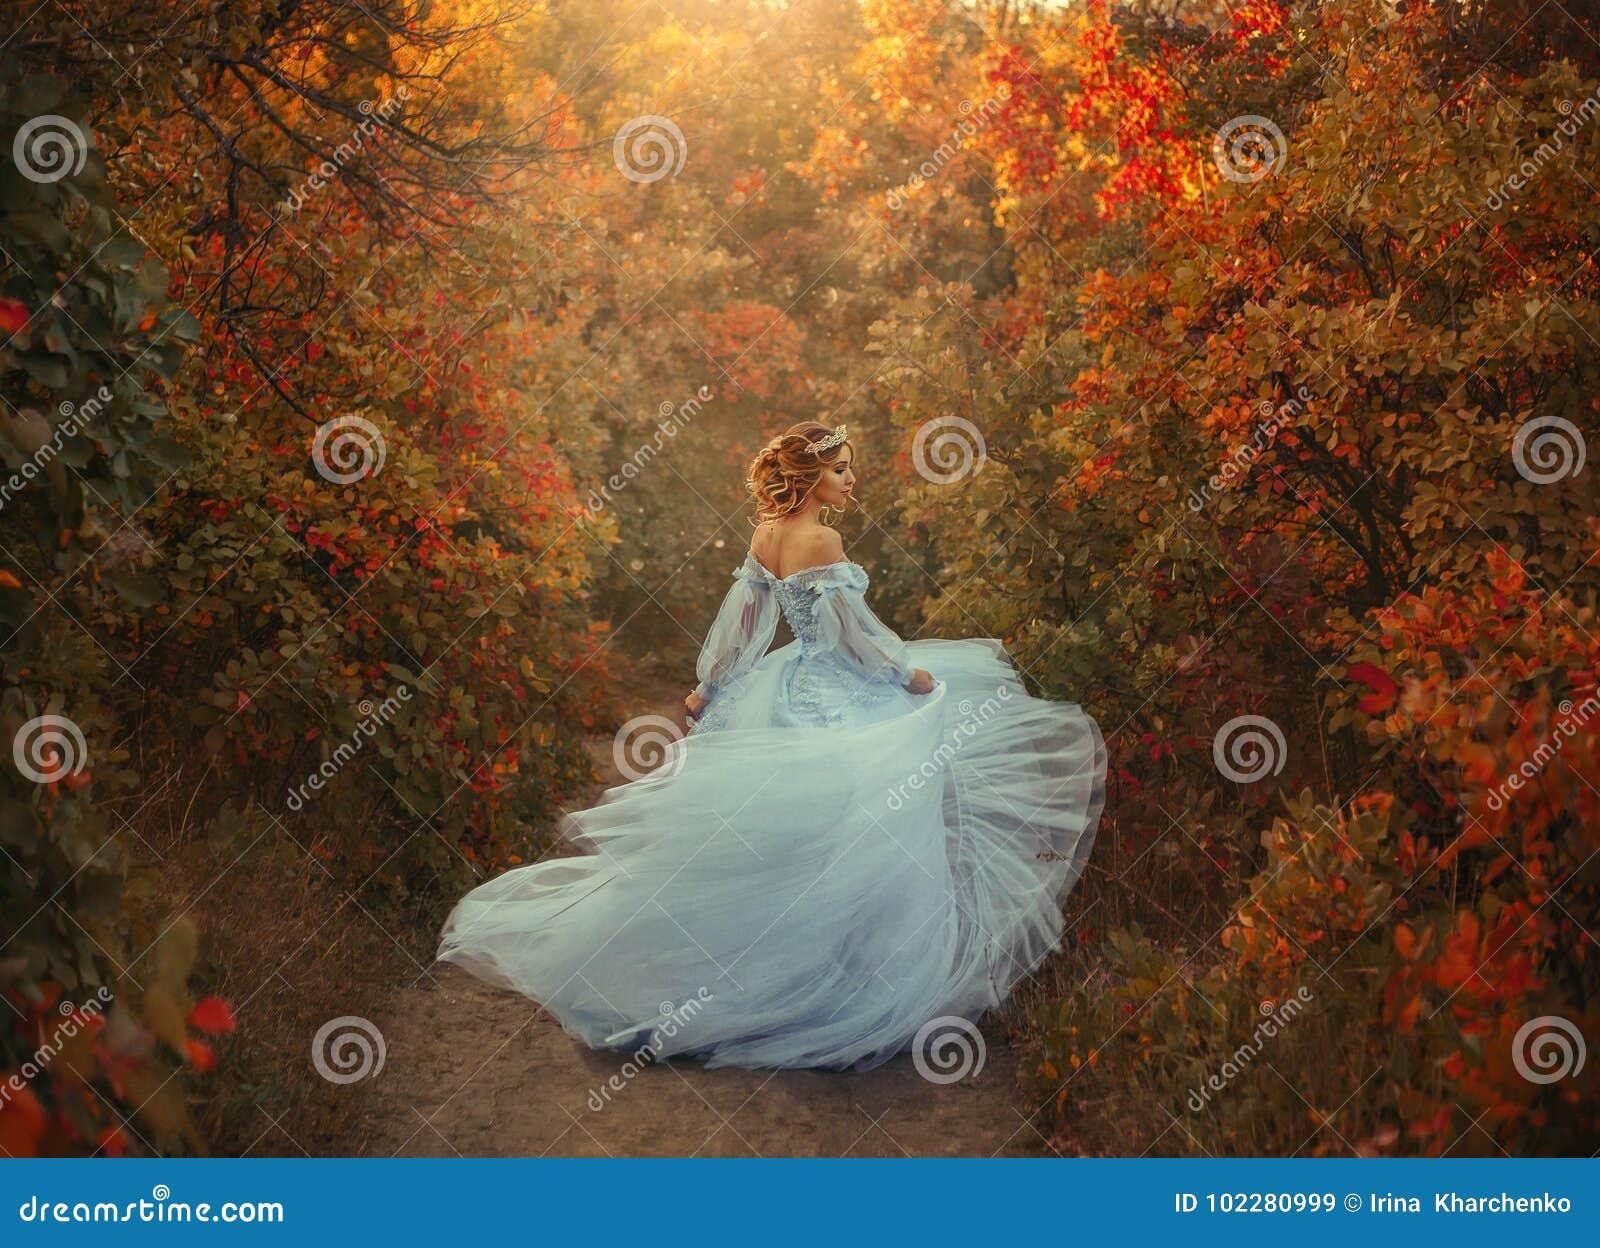 Princesa no jardim do outono